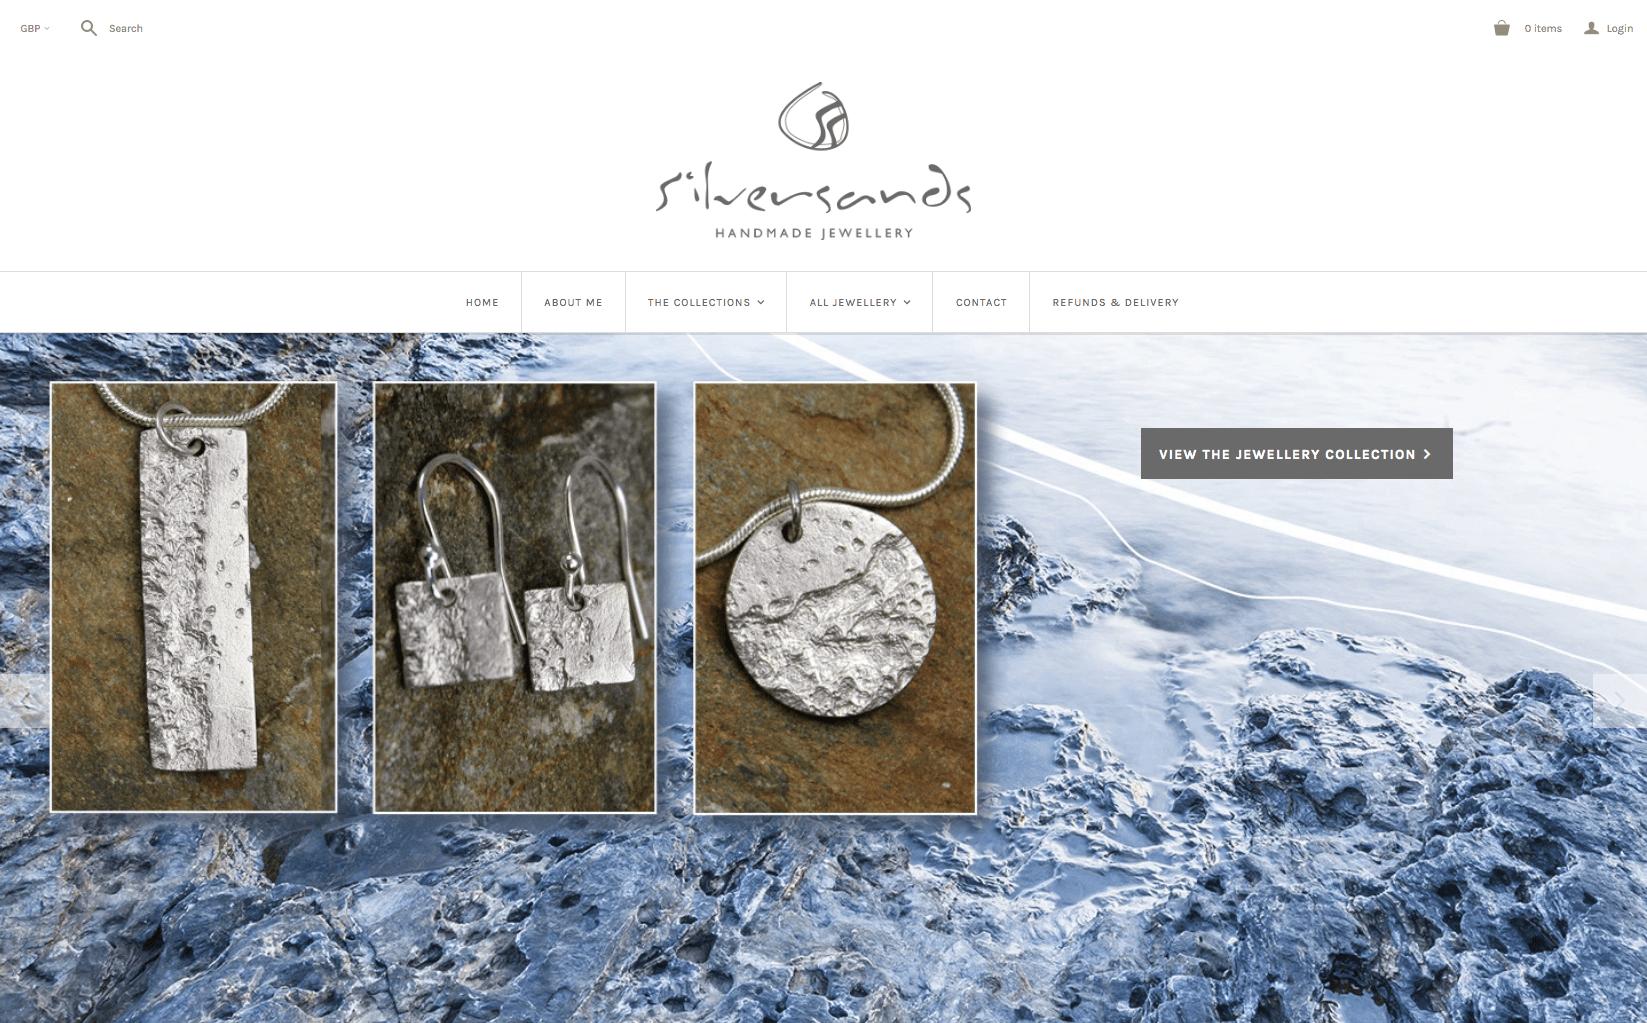 'Silversands' Handmade Silver Jewellery